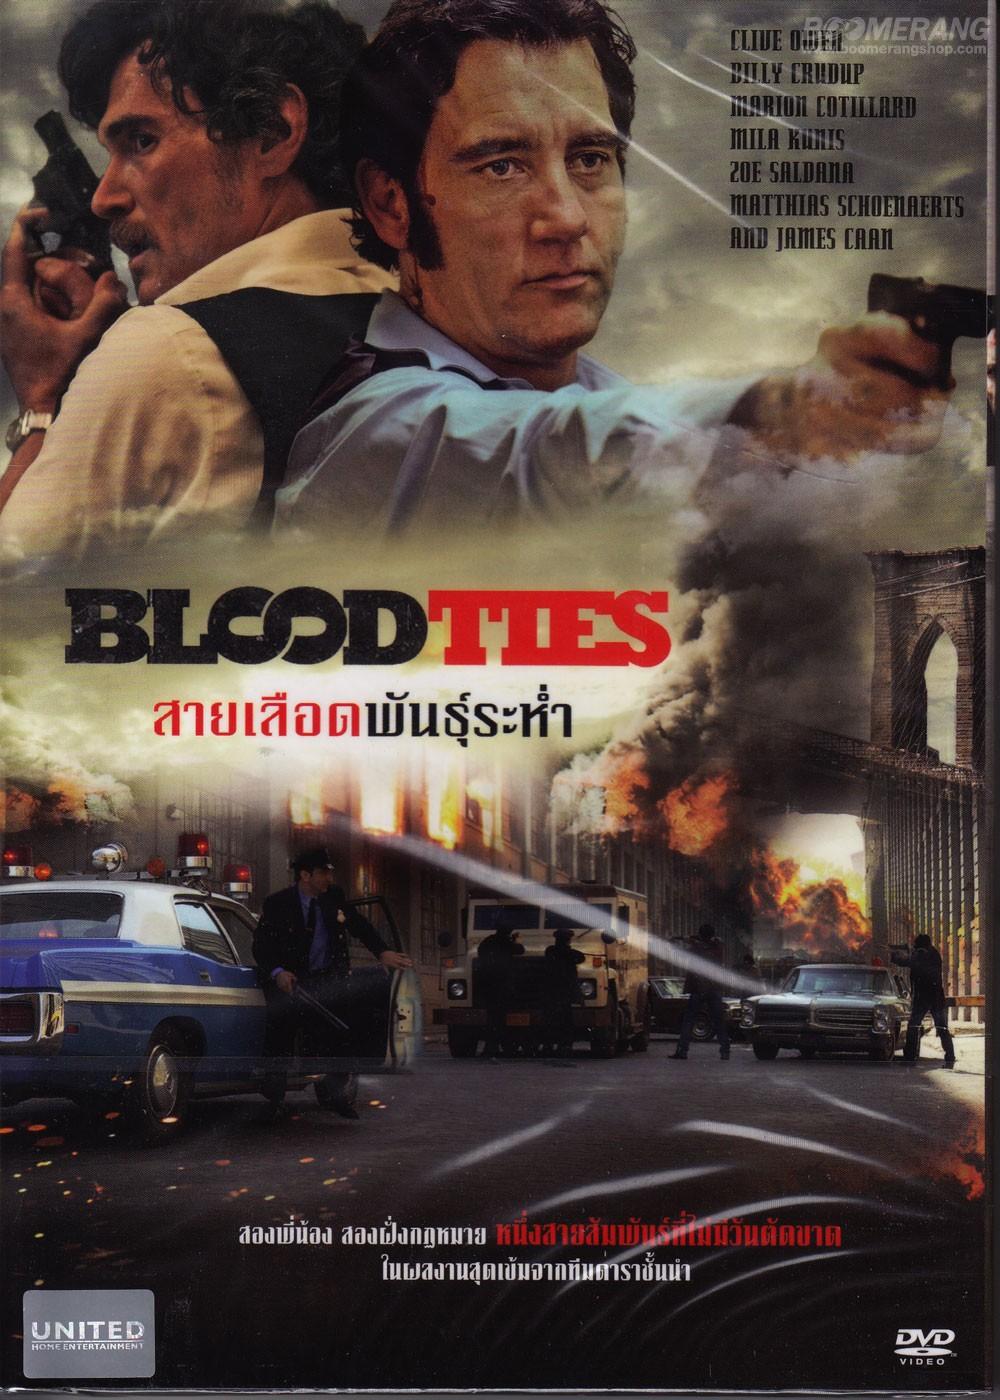 Blood Ties /สายเลือดพันธุ์ระห่ำ (DVD SE) (Reprice ...